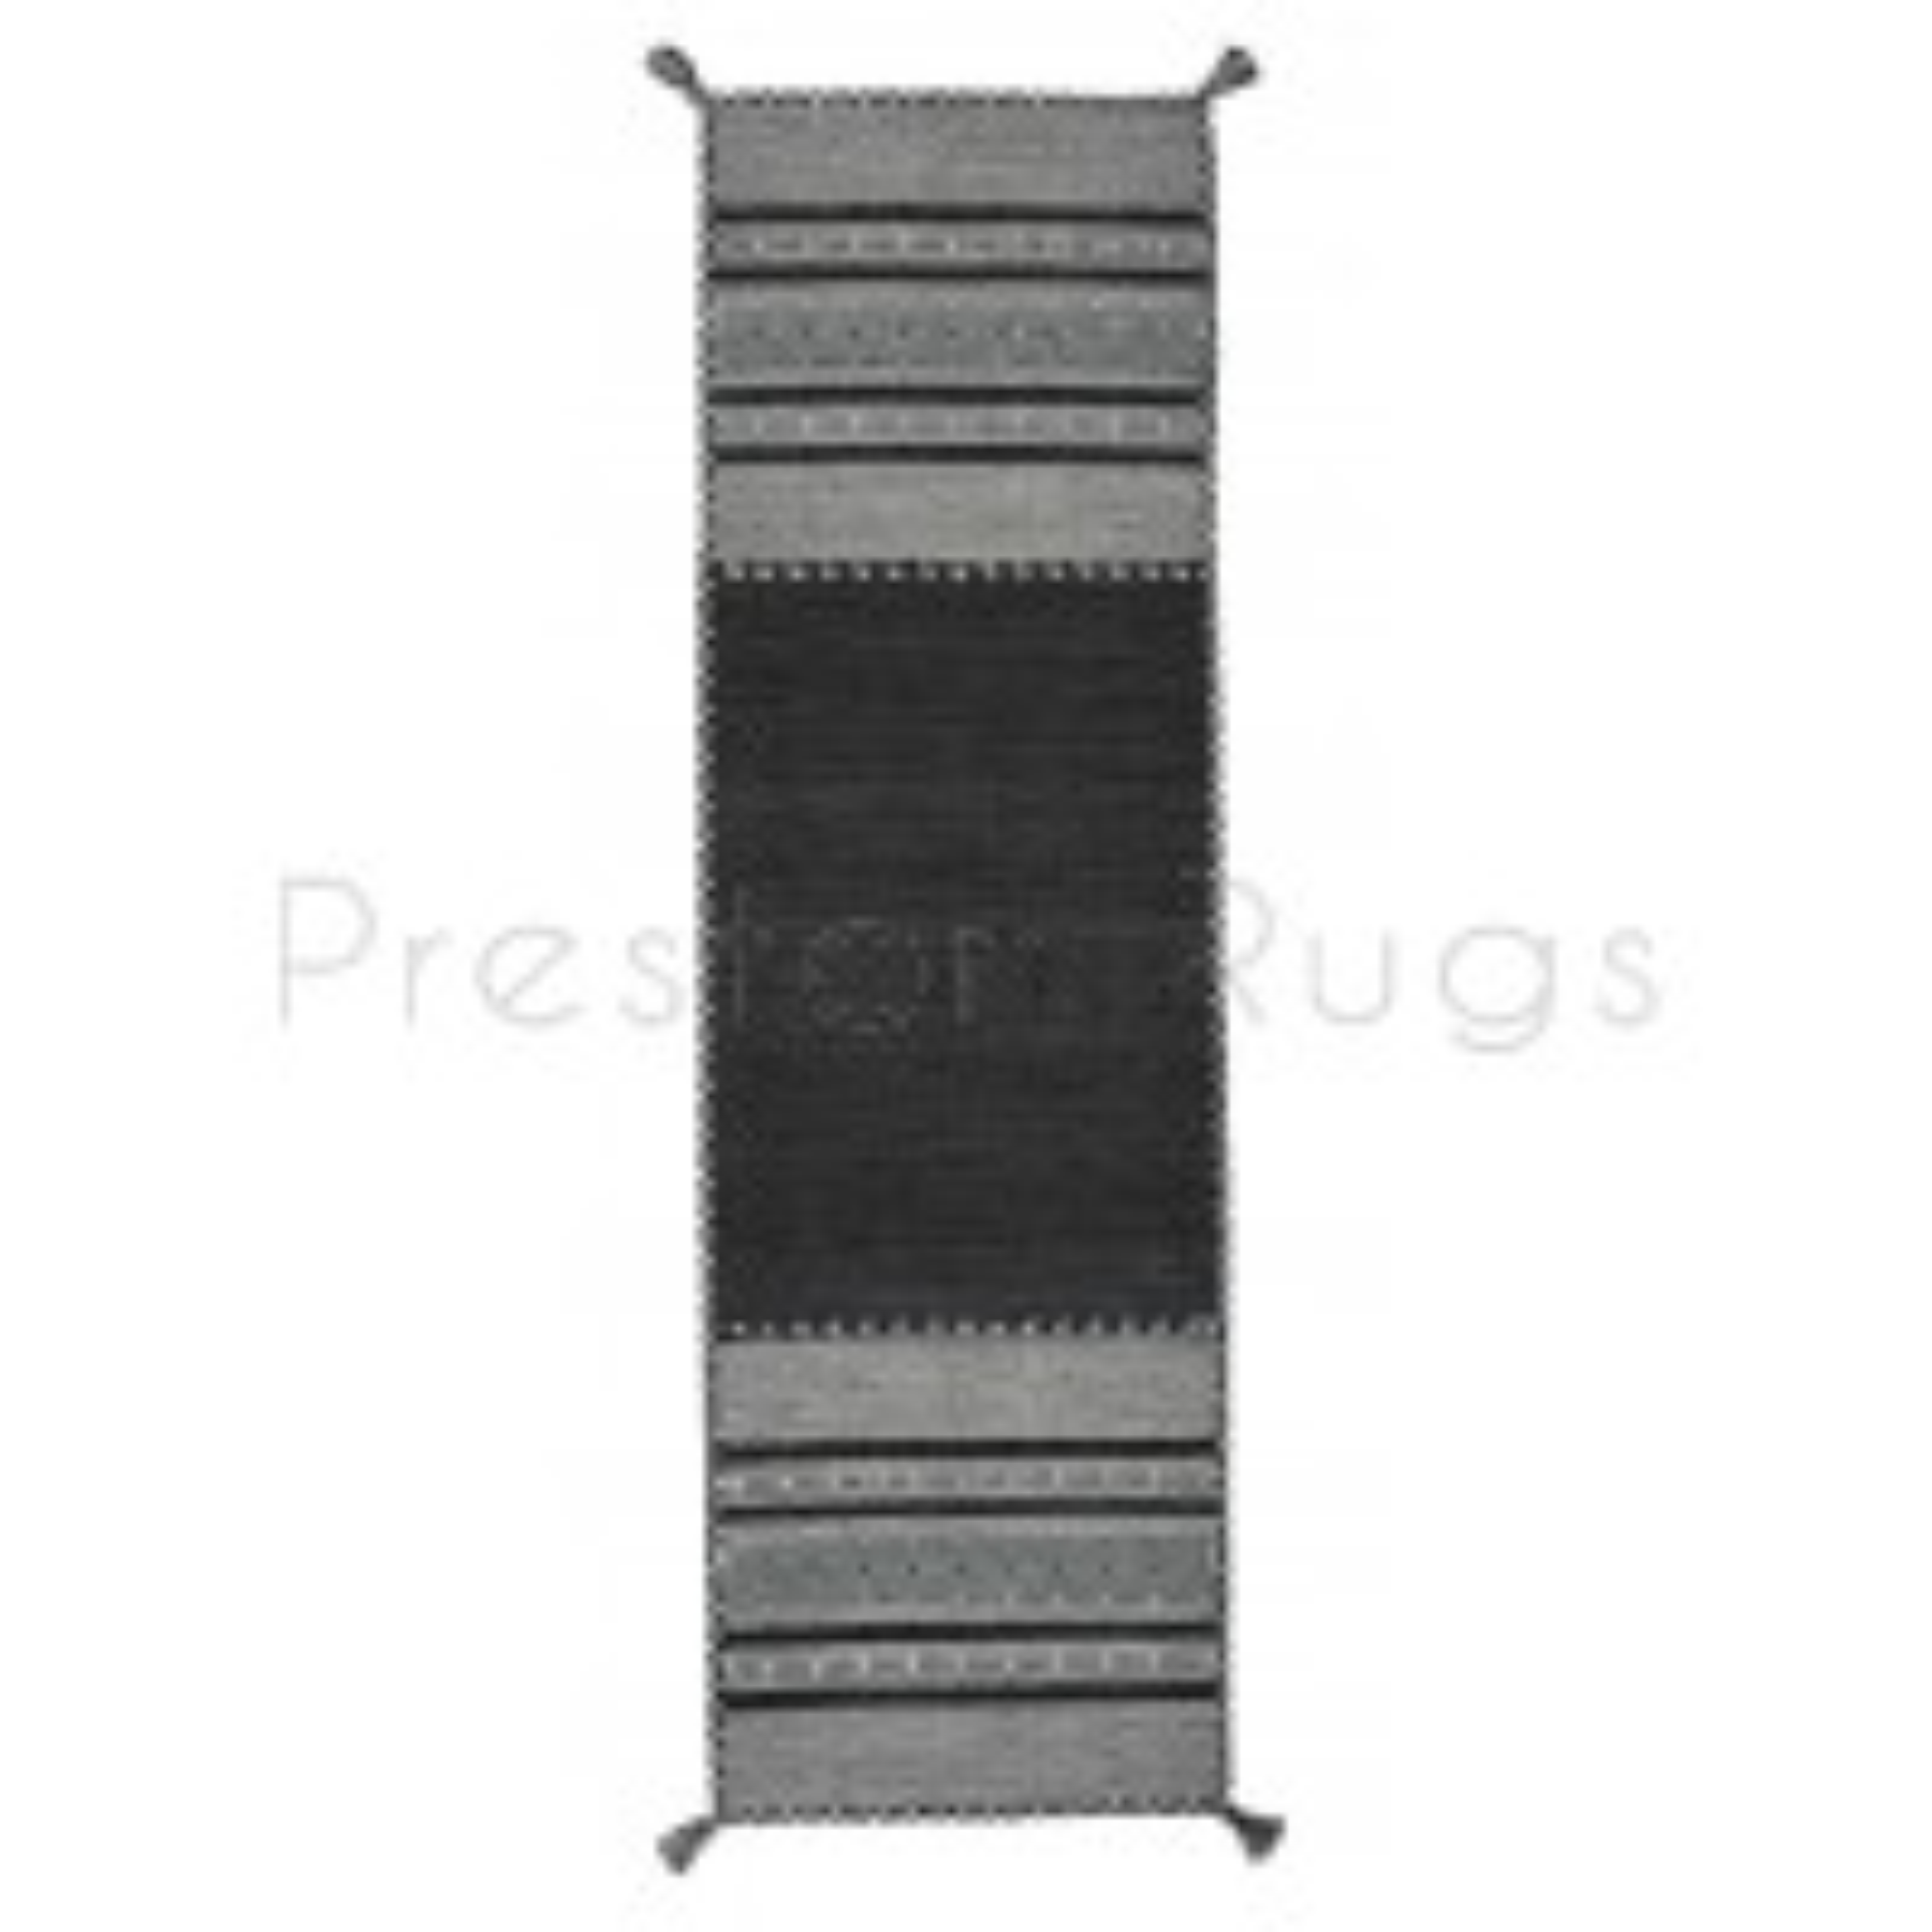 "Kelim Flat-weave Rug - Charcoal-Runner 67 x 220 cm (2'2"" x 7'3"")"